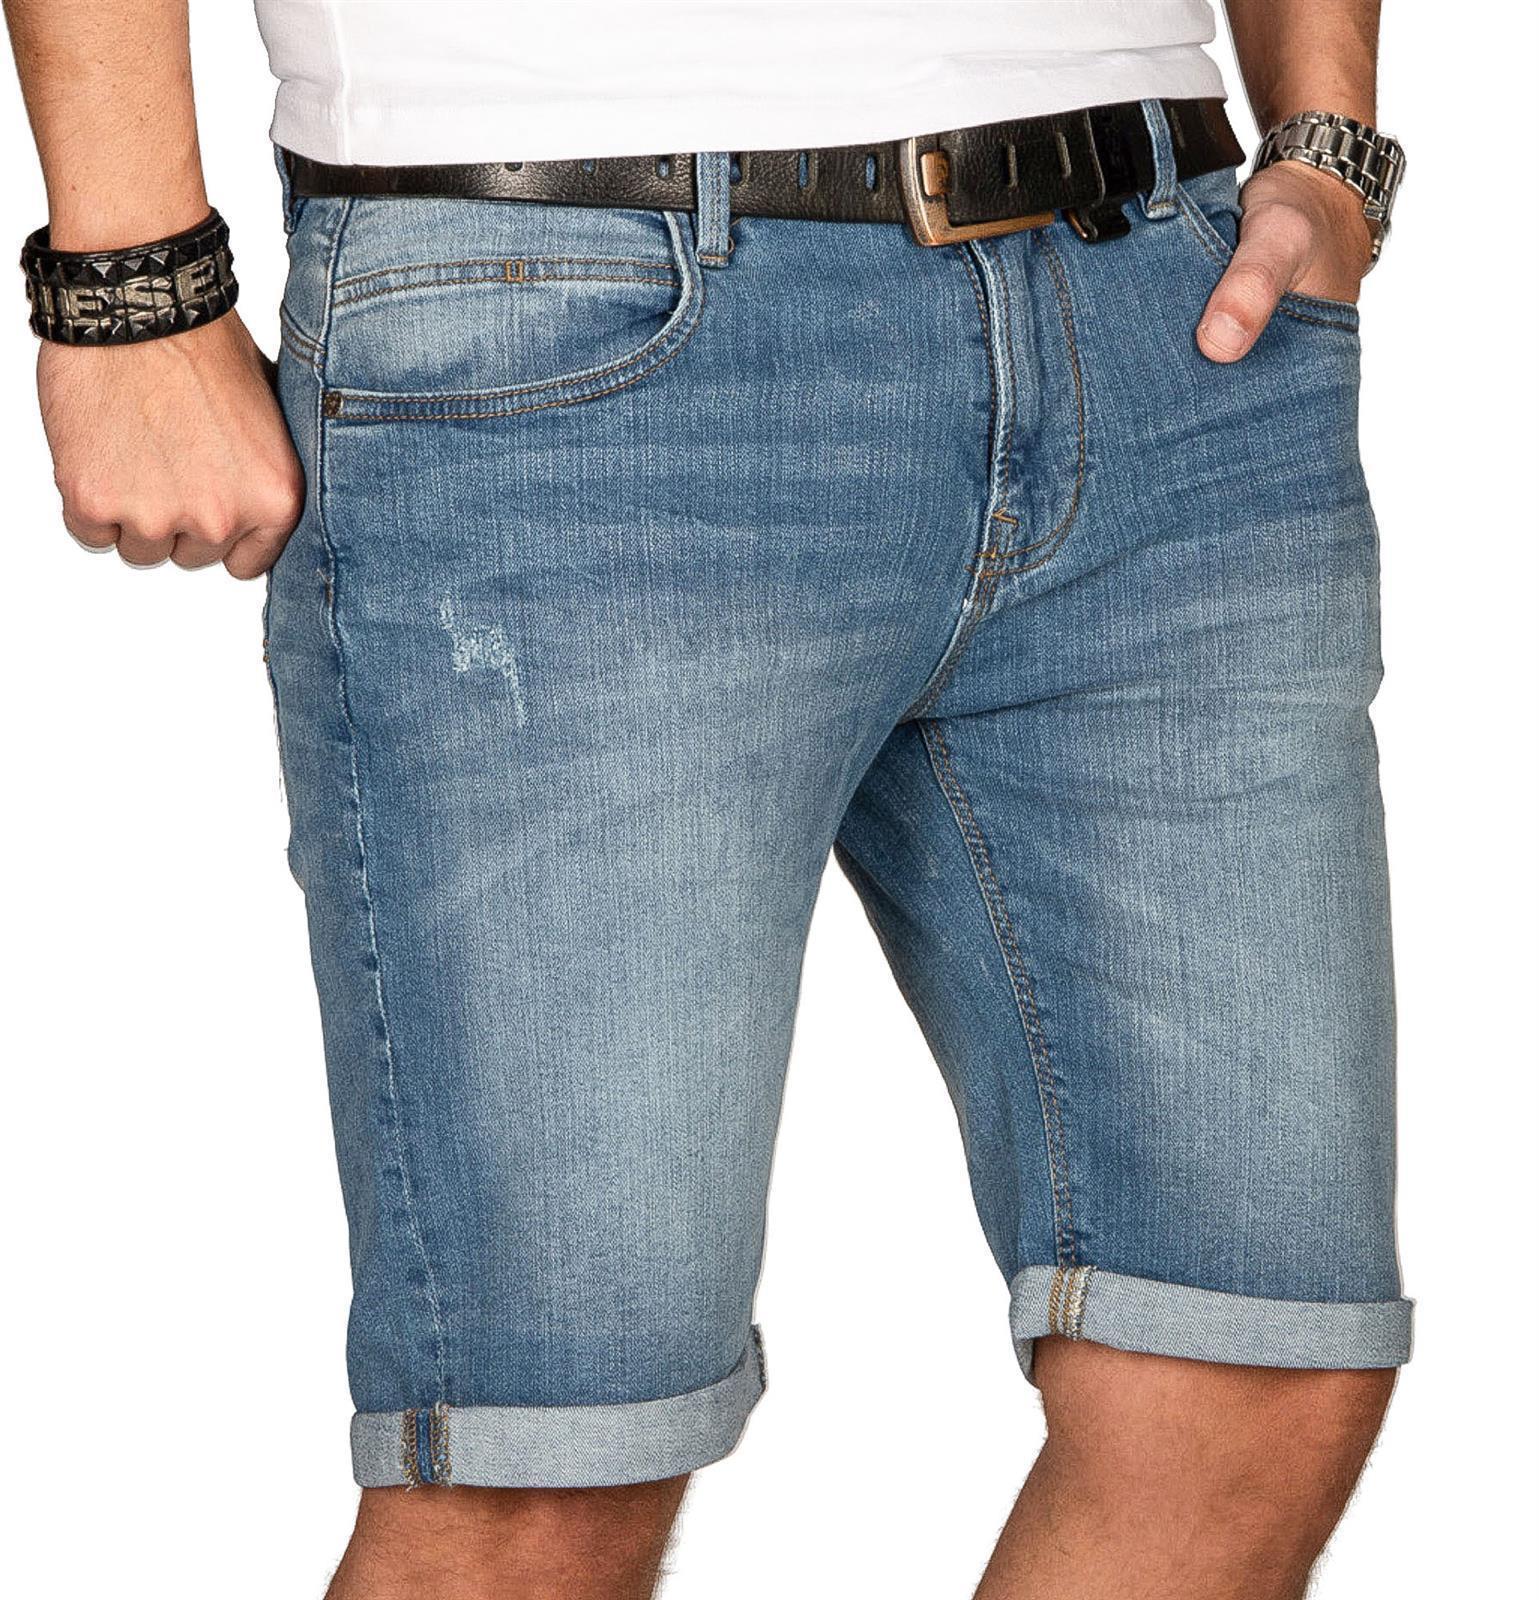 Indicode-Herren-Sommer-Bermuda-Jeans-Shorts-kurze-Hose-Sommerhose-Short-Neu-B556 Indexbild 11